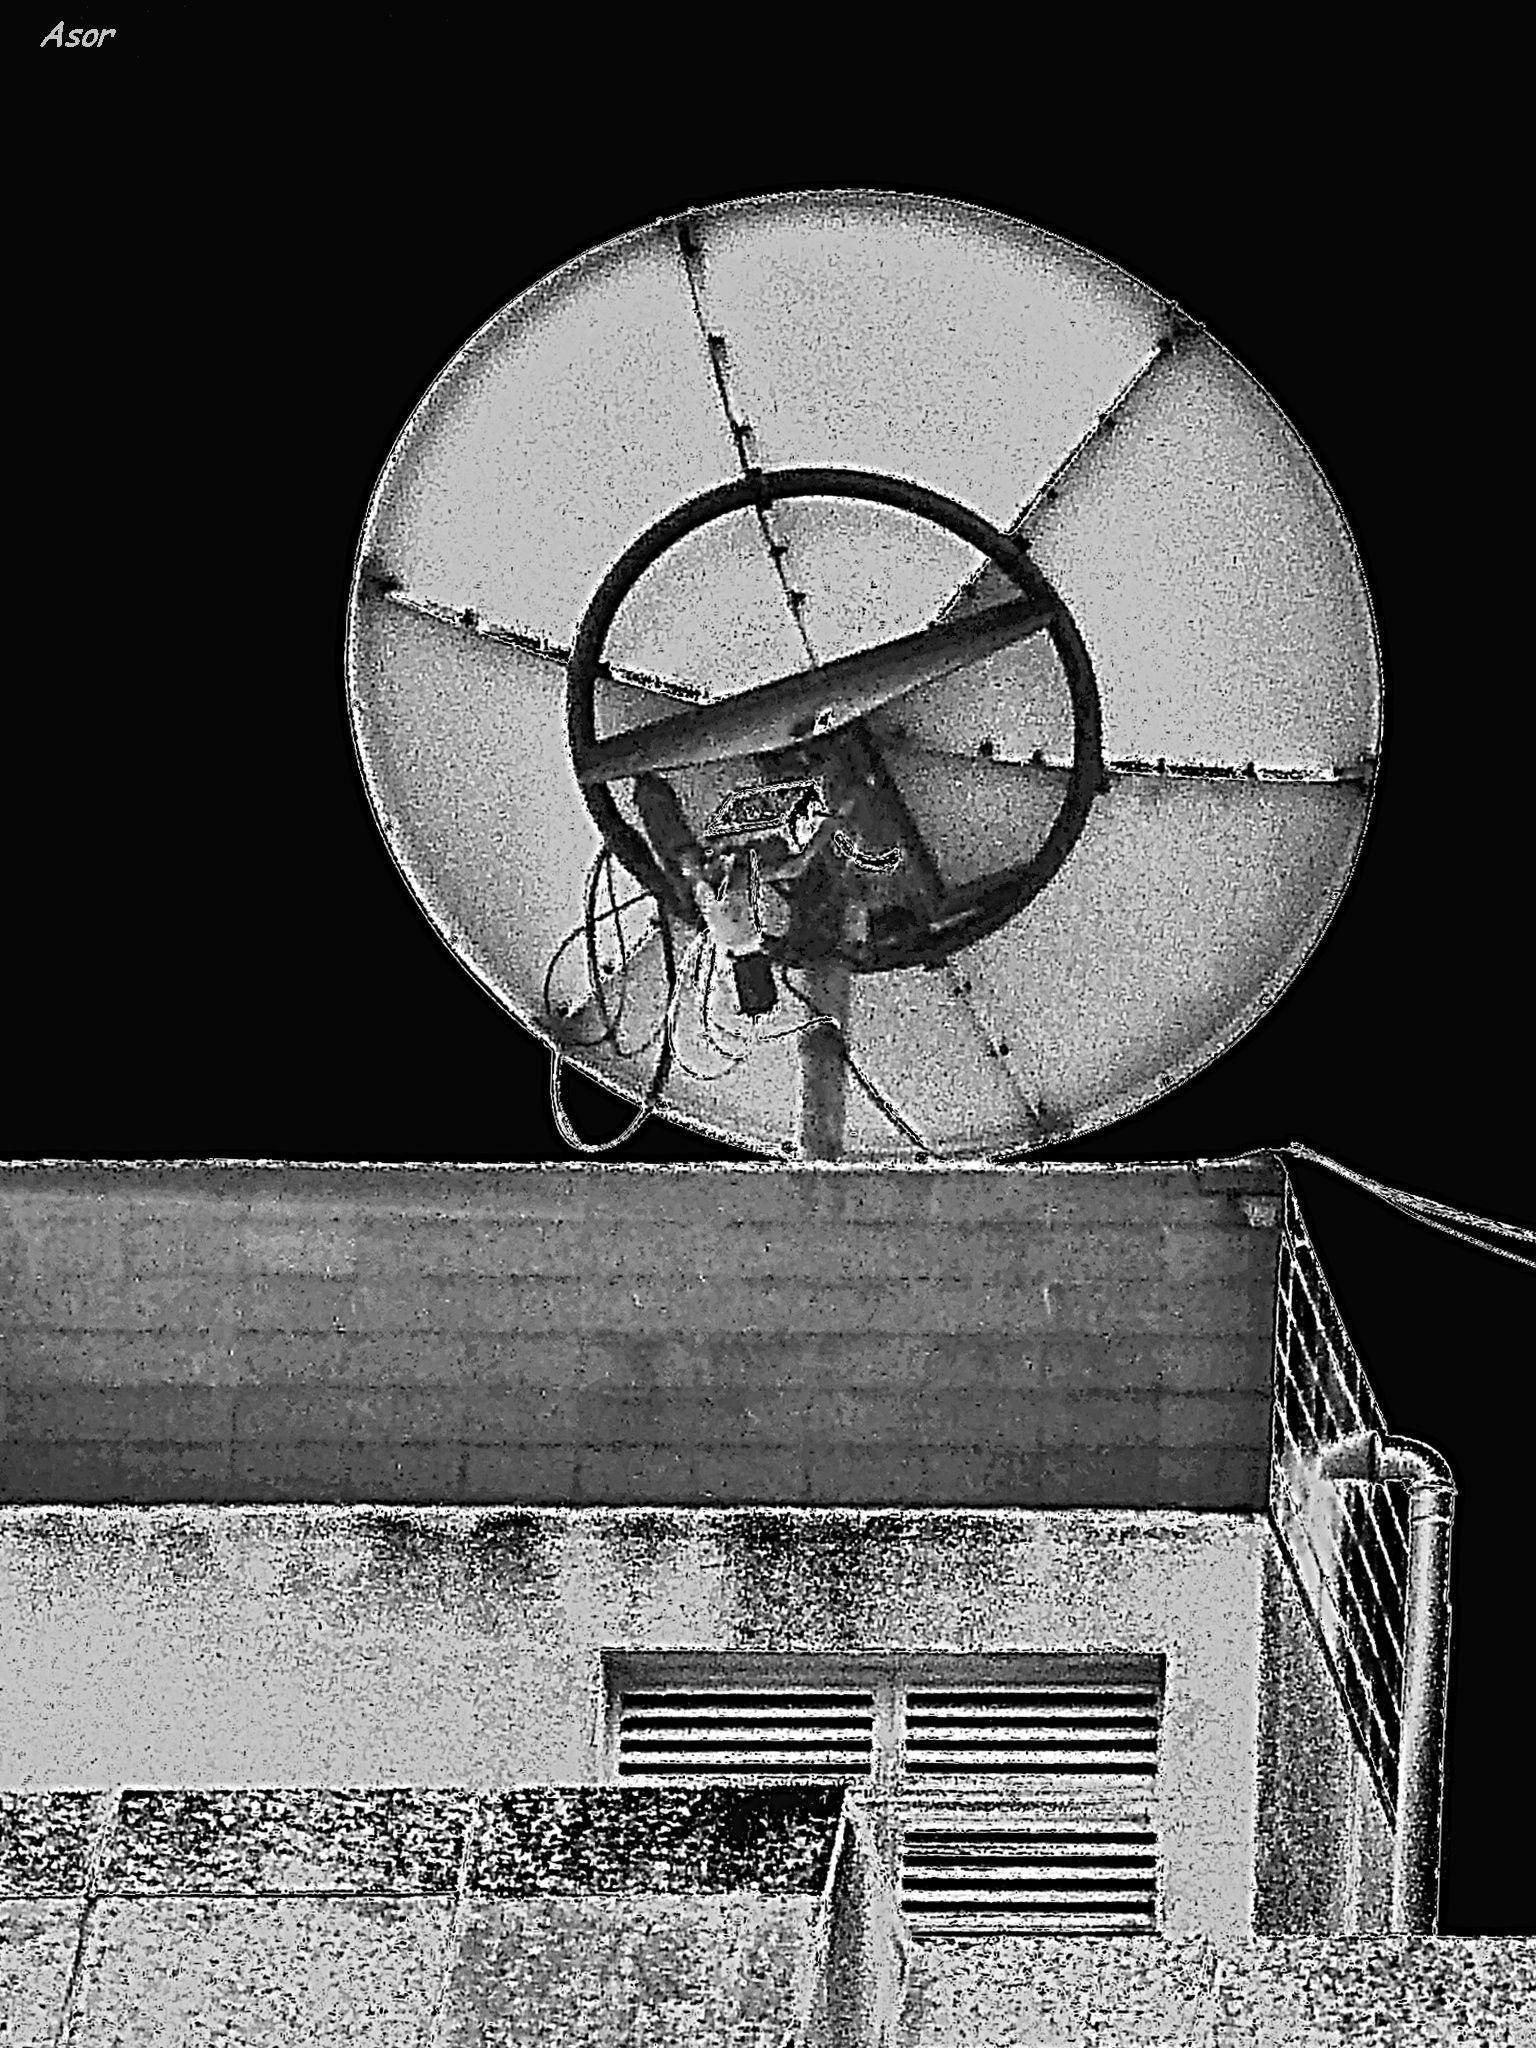 Alien urban by asorairam on 500px